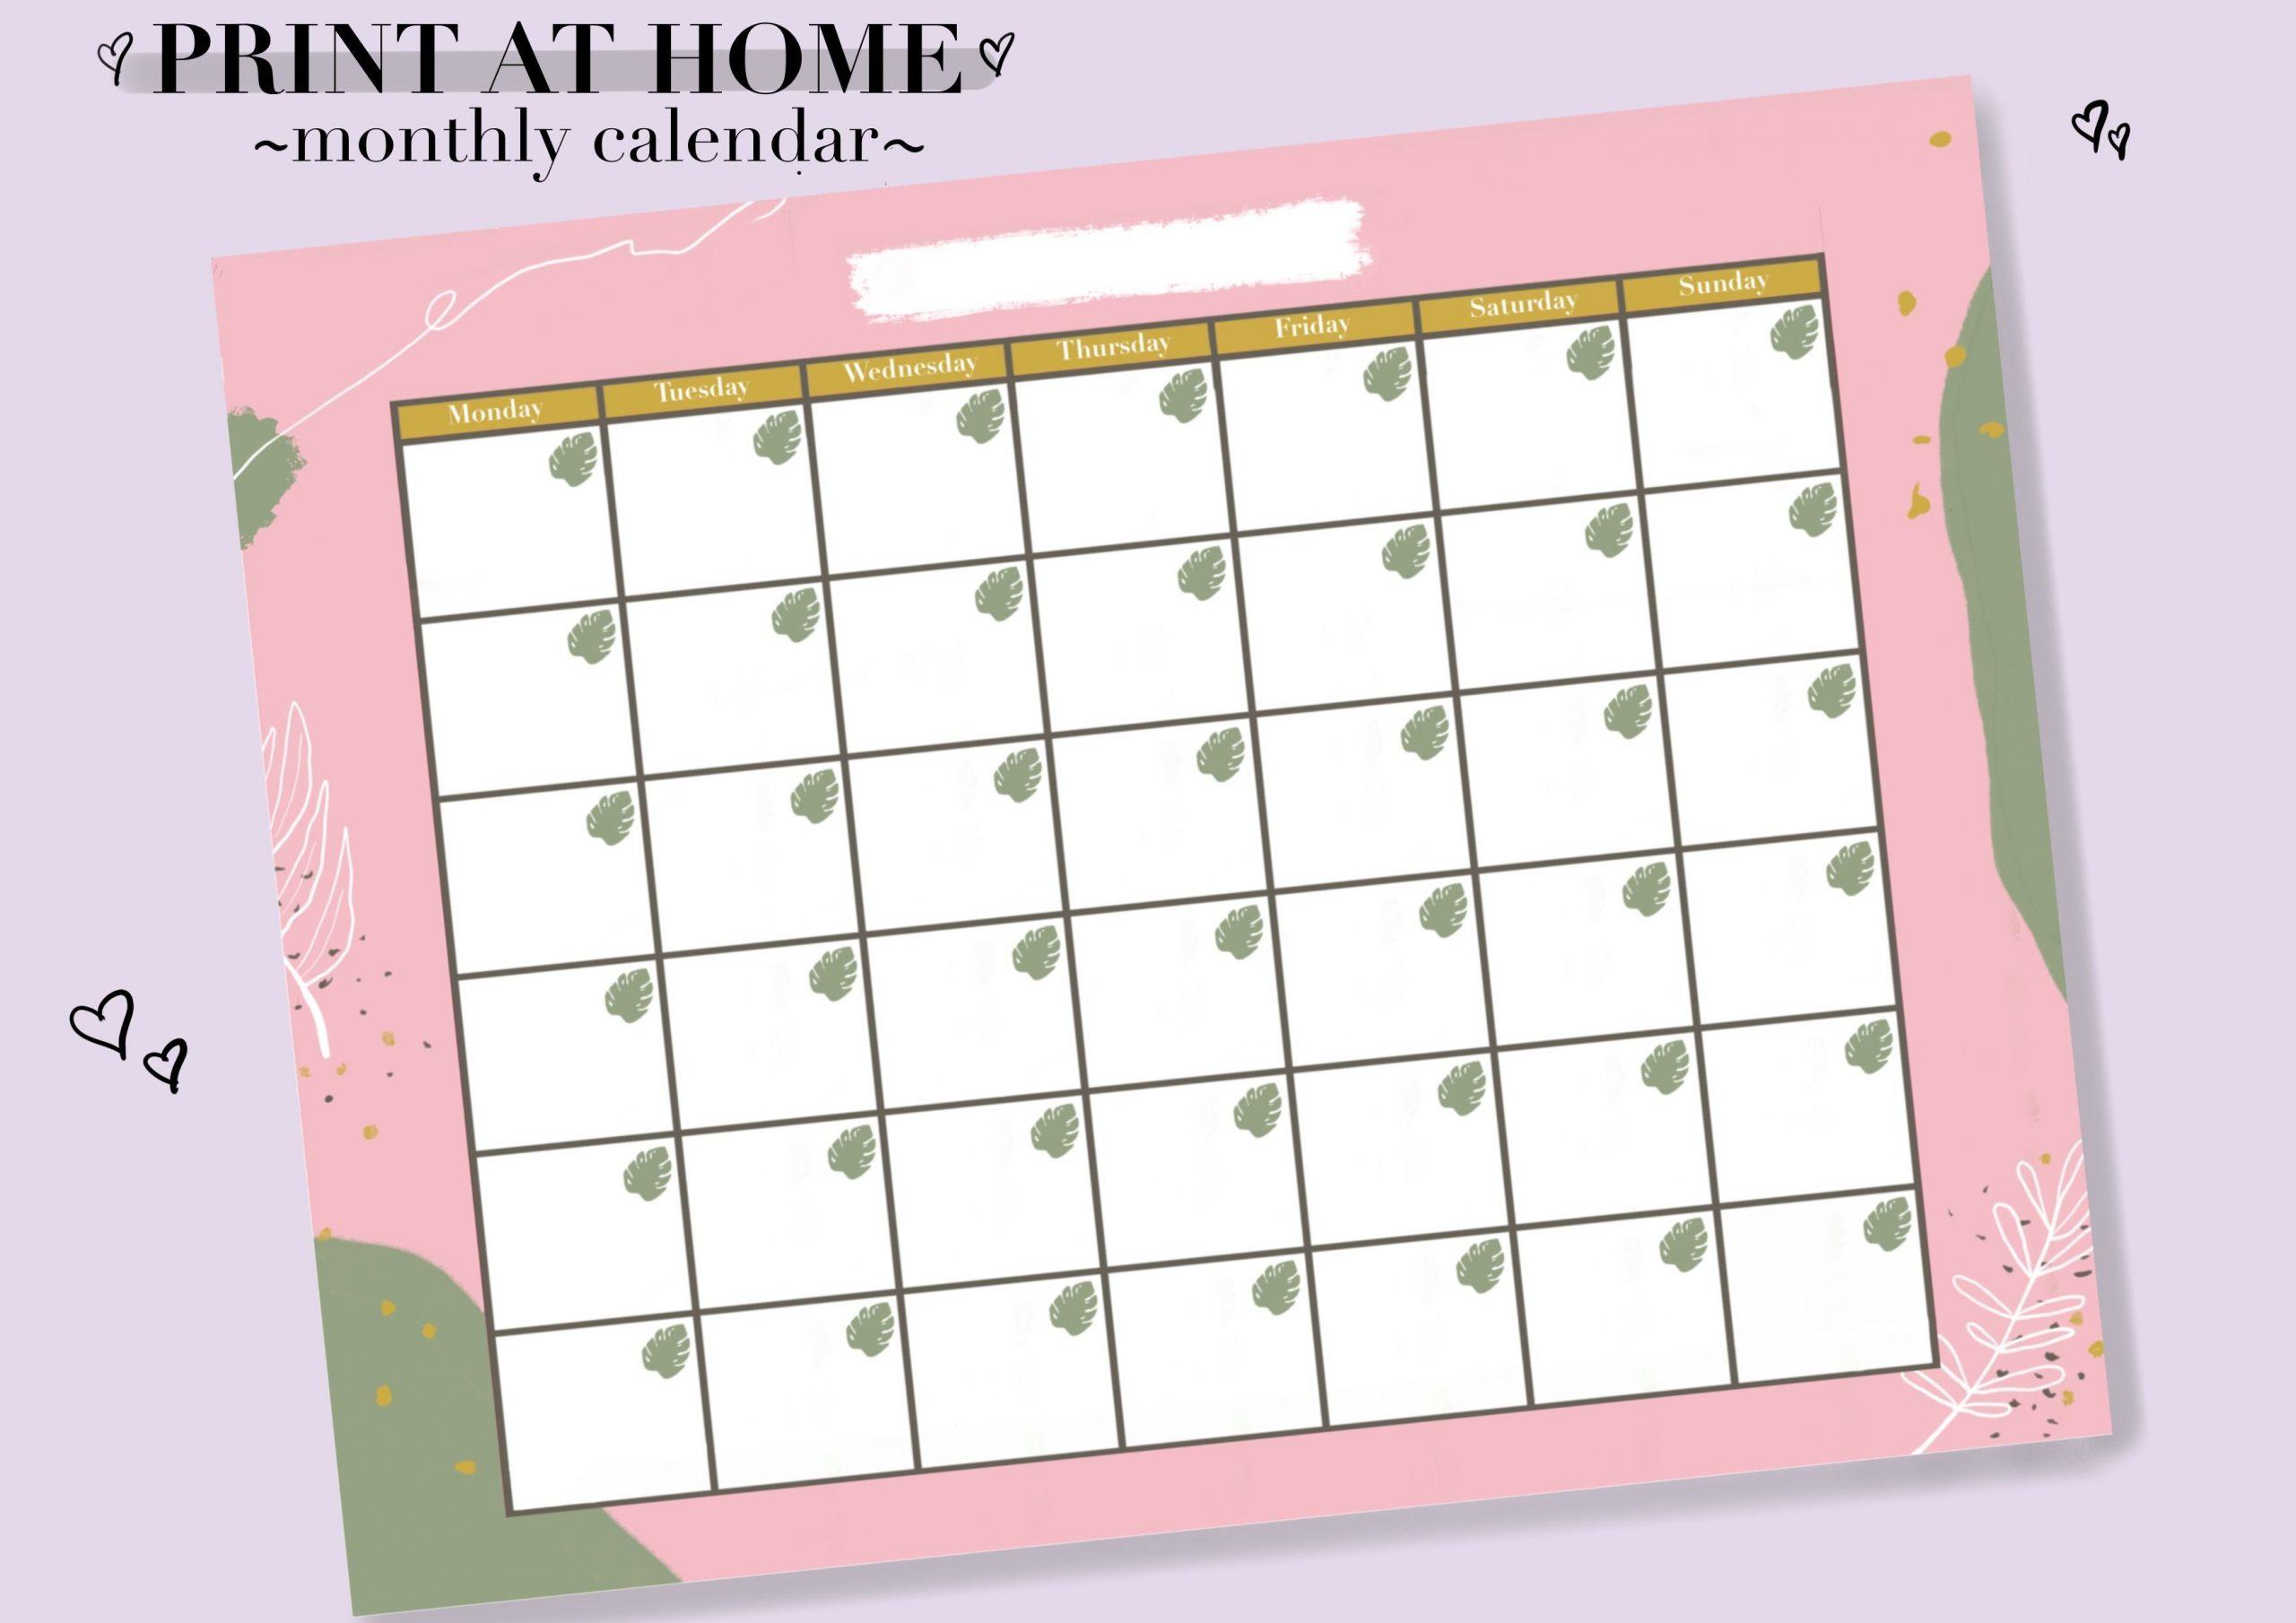 2020/2021 Monthly Calendar Digital Download Pdf, Printable 11 X 17 April Calendar